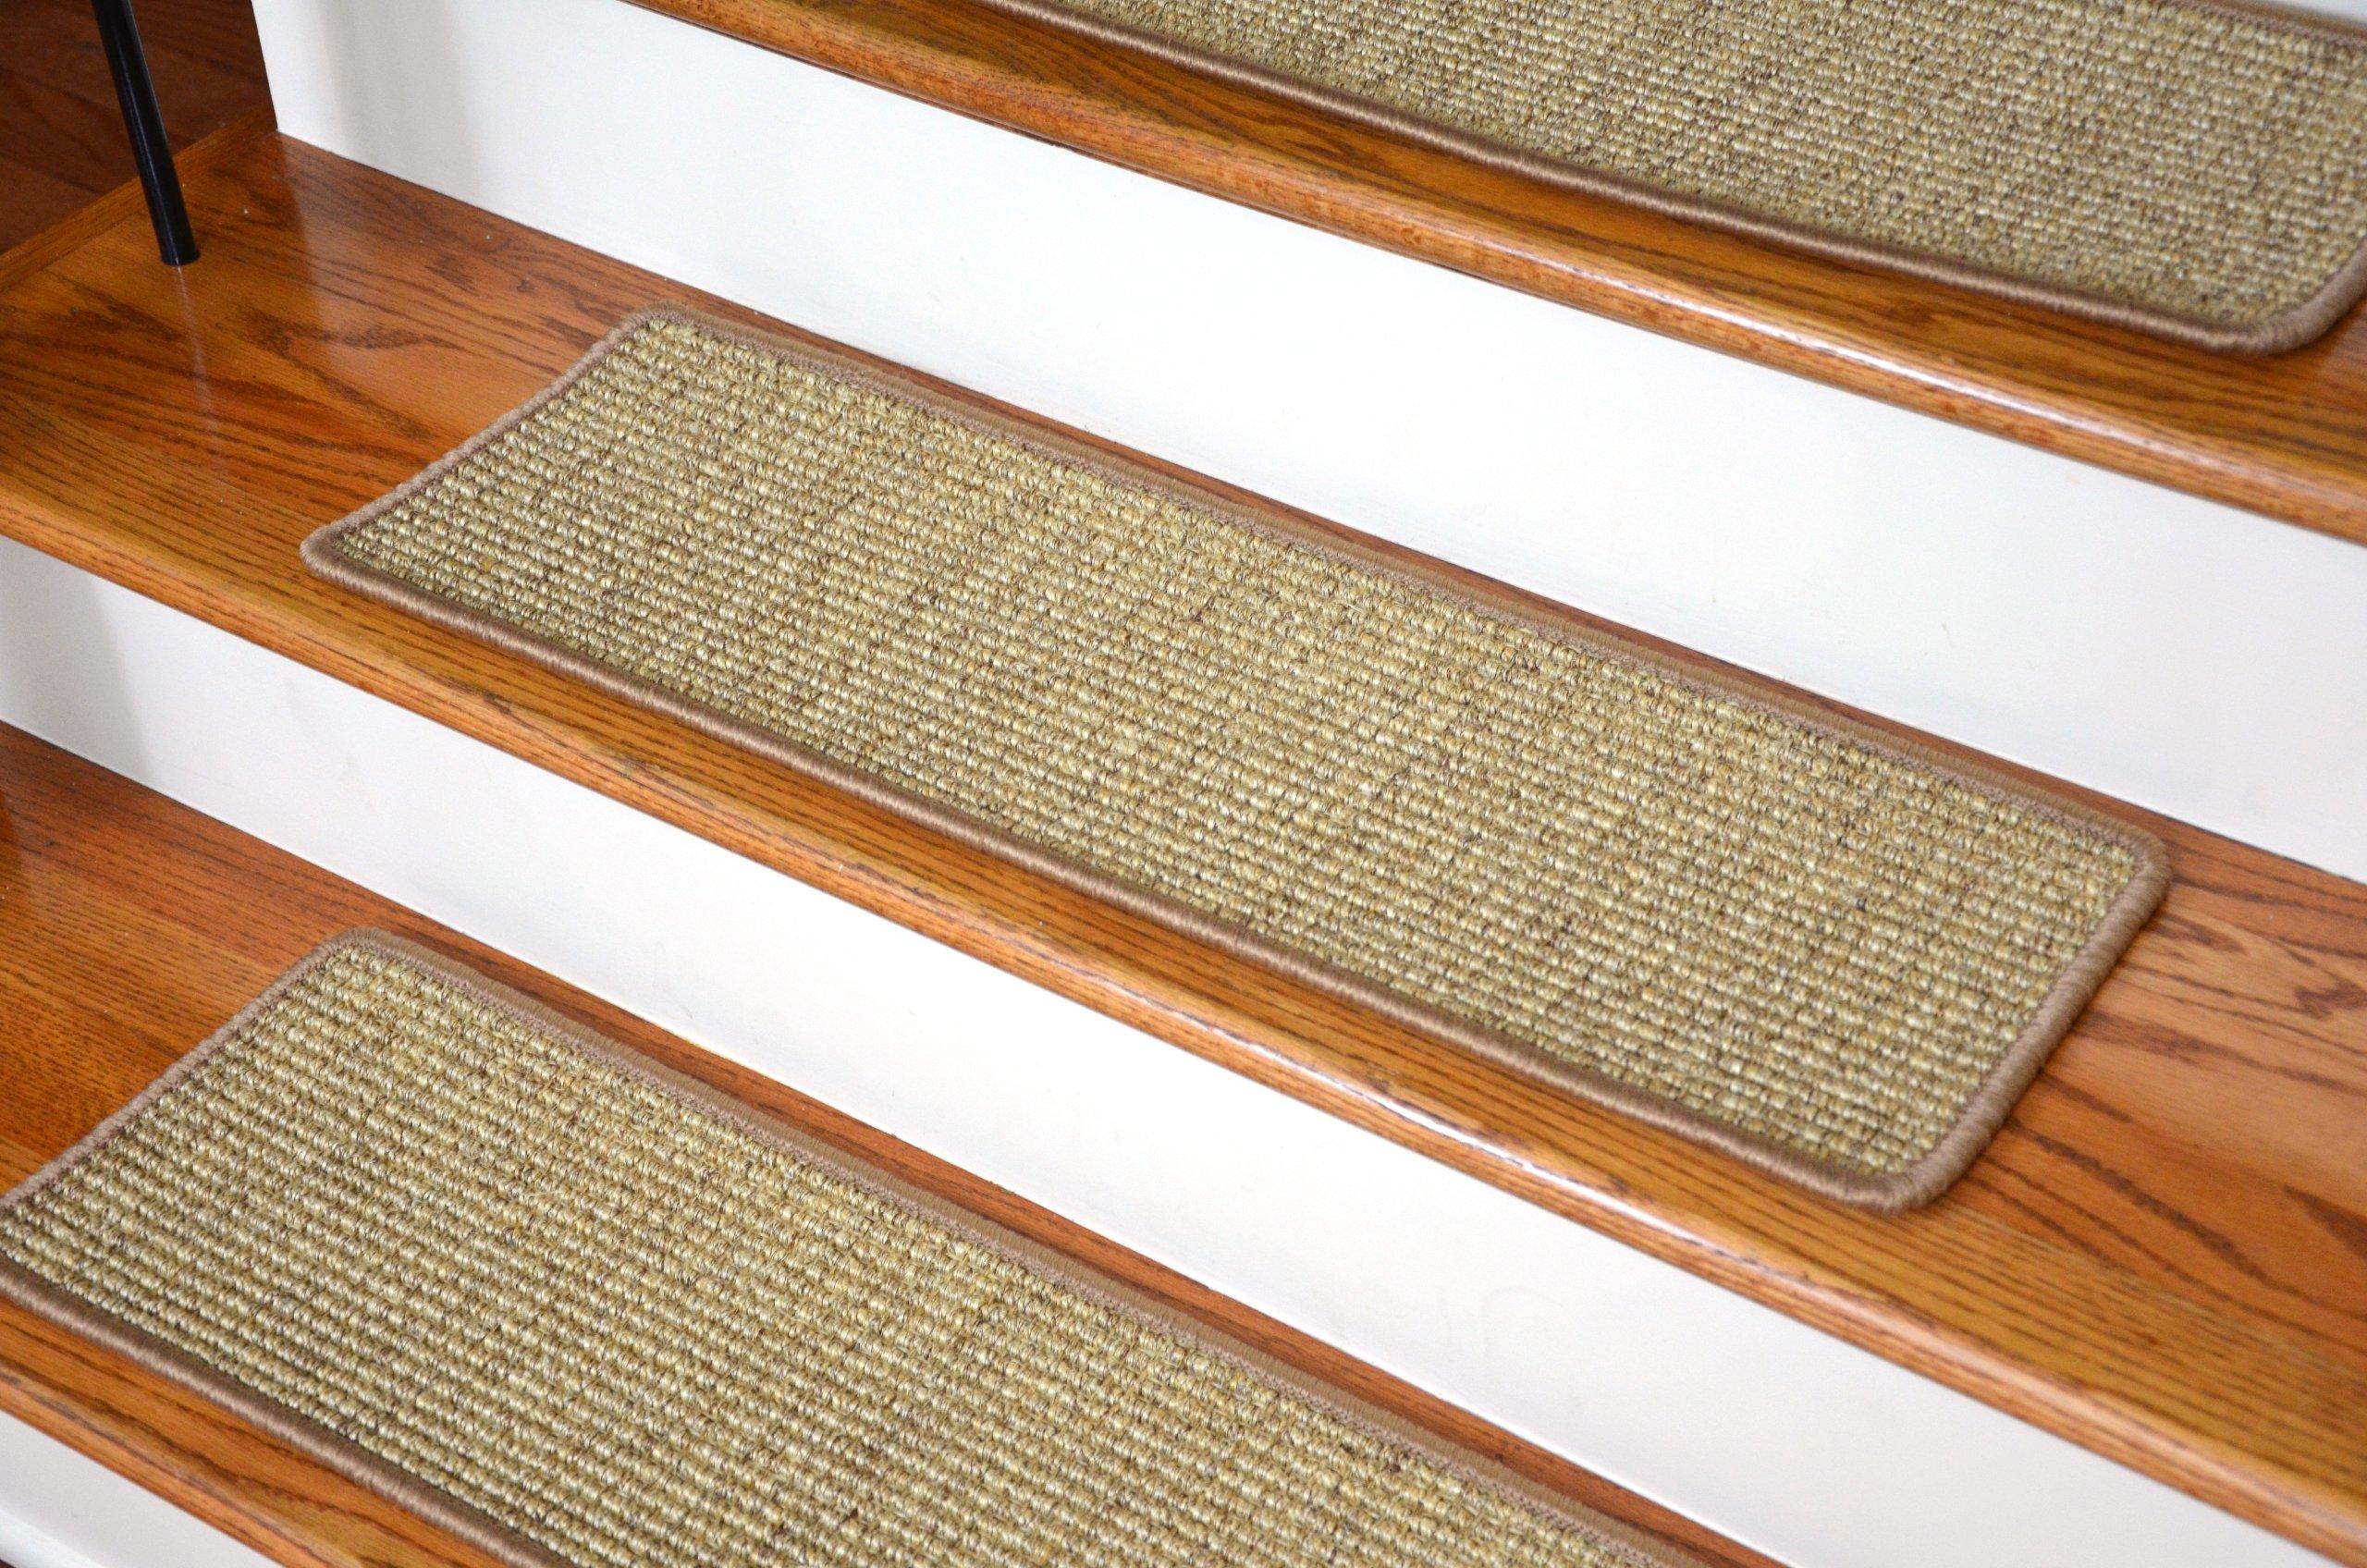 Dean Attachable Non-Skid Sisal Carpet Stair Treads - Desert - Set of 13 by Dean Flooring Company